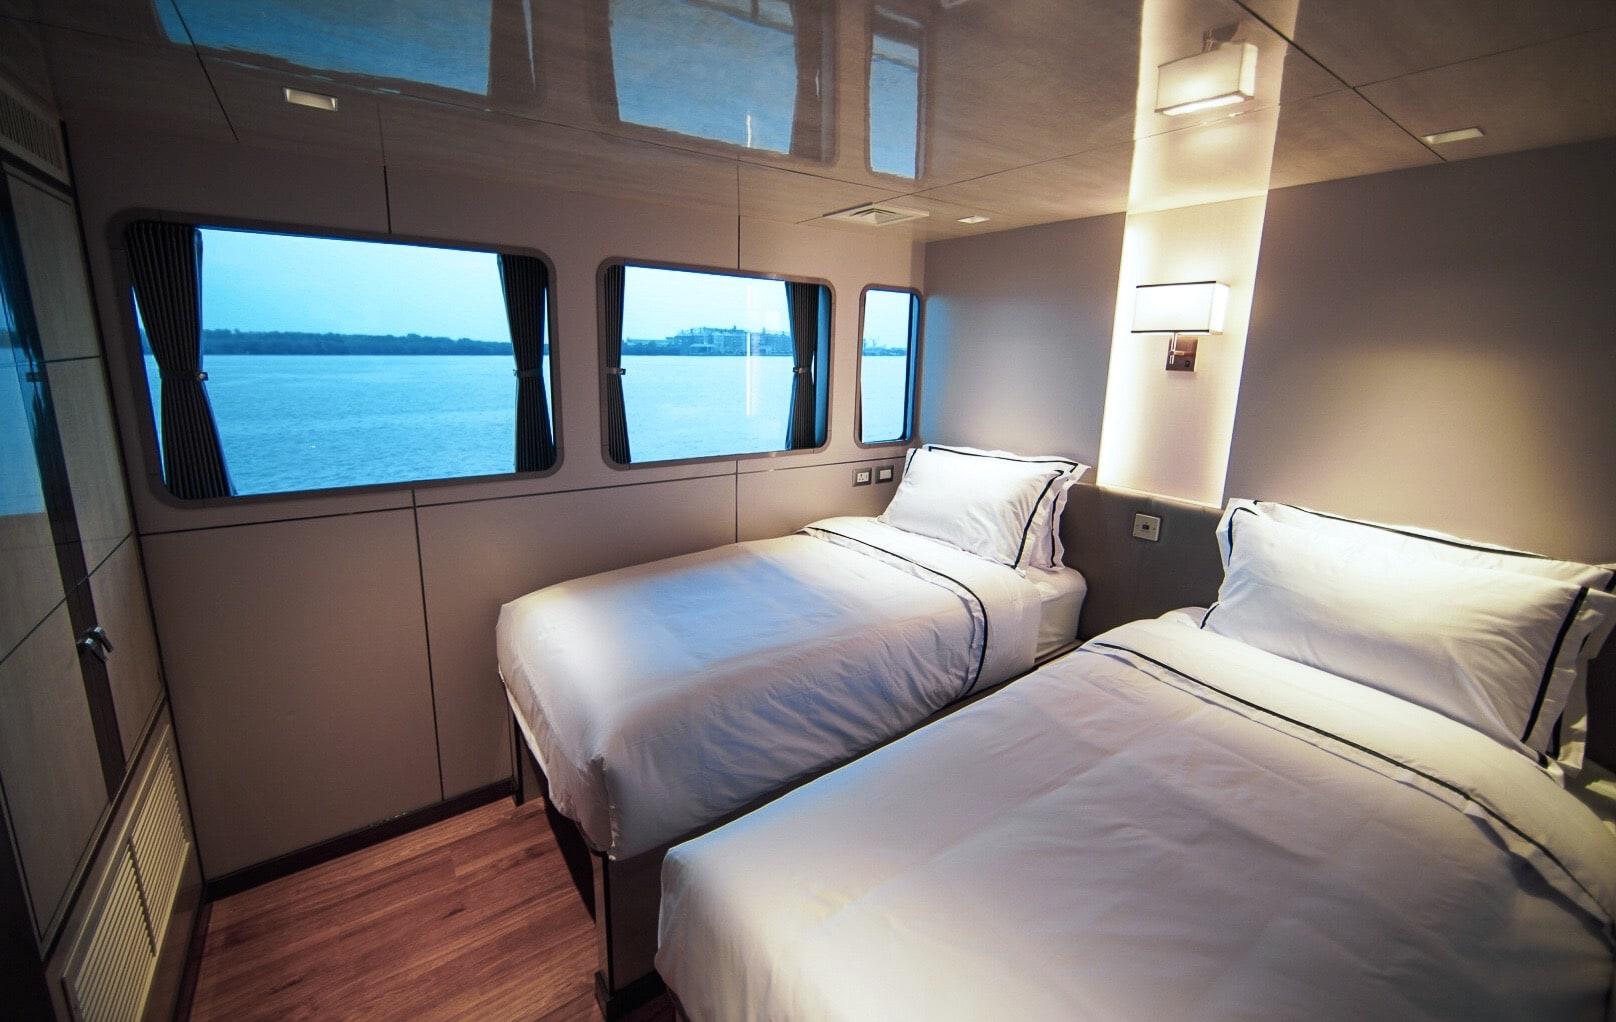 Elite cabin on the scuba liveaboard All Star Velocean in Indonesia